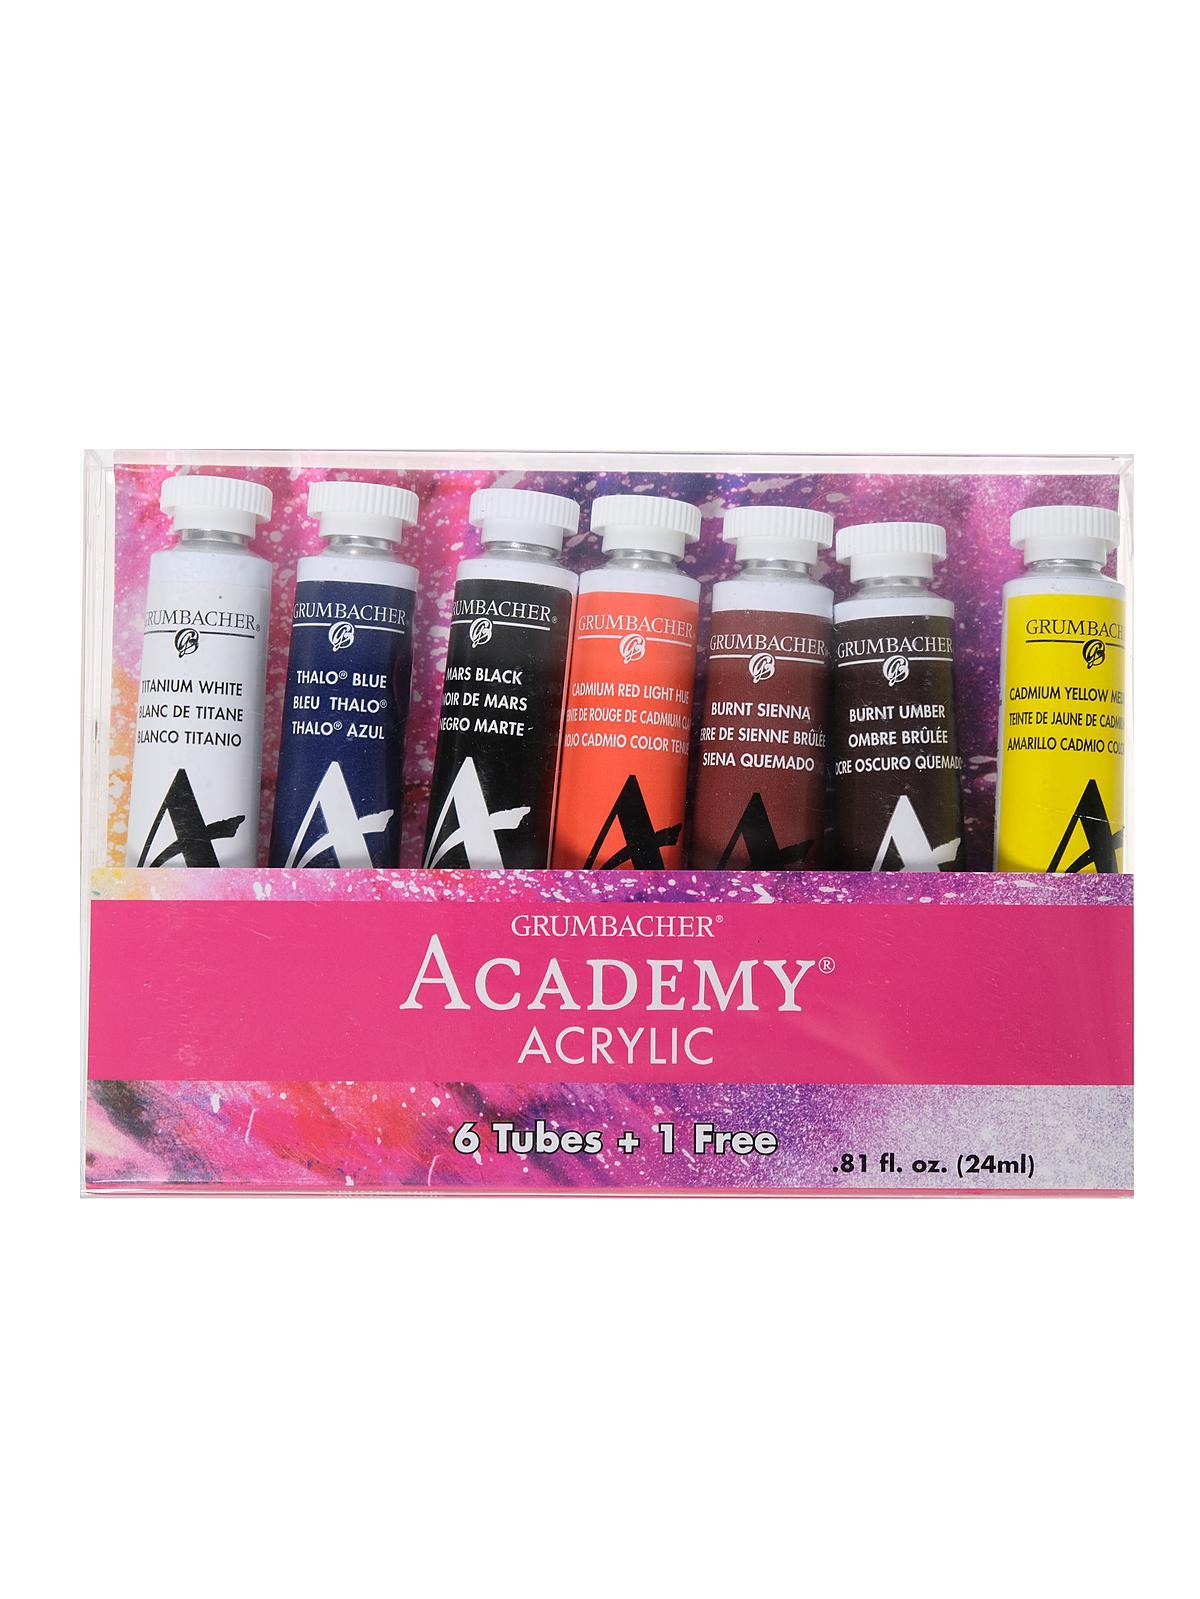 Academy Acrylic Bonus Set